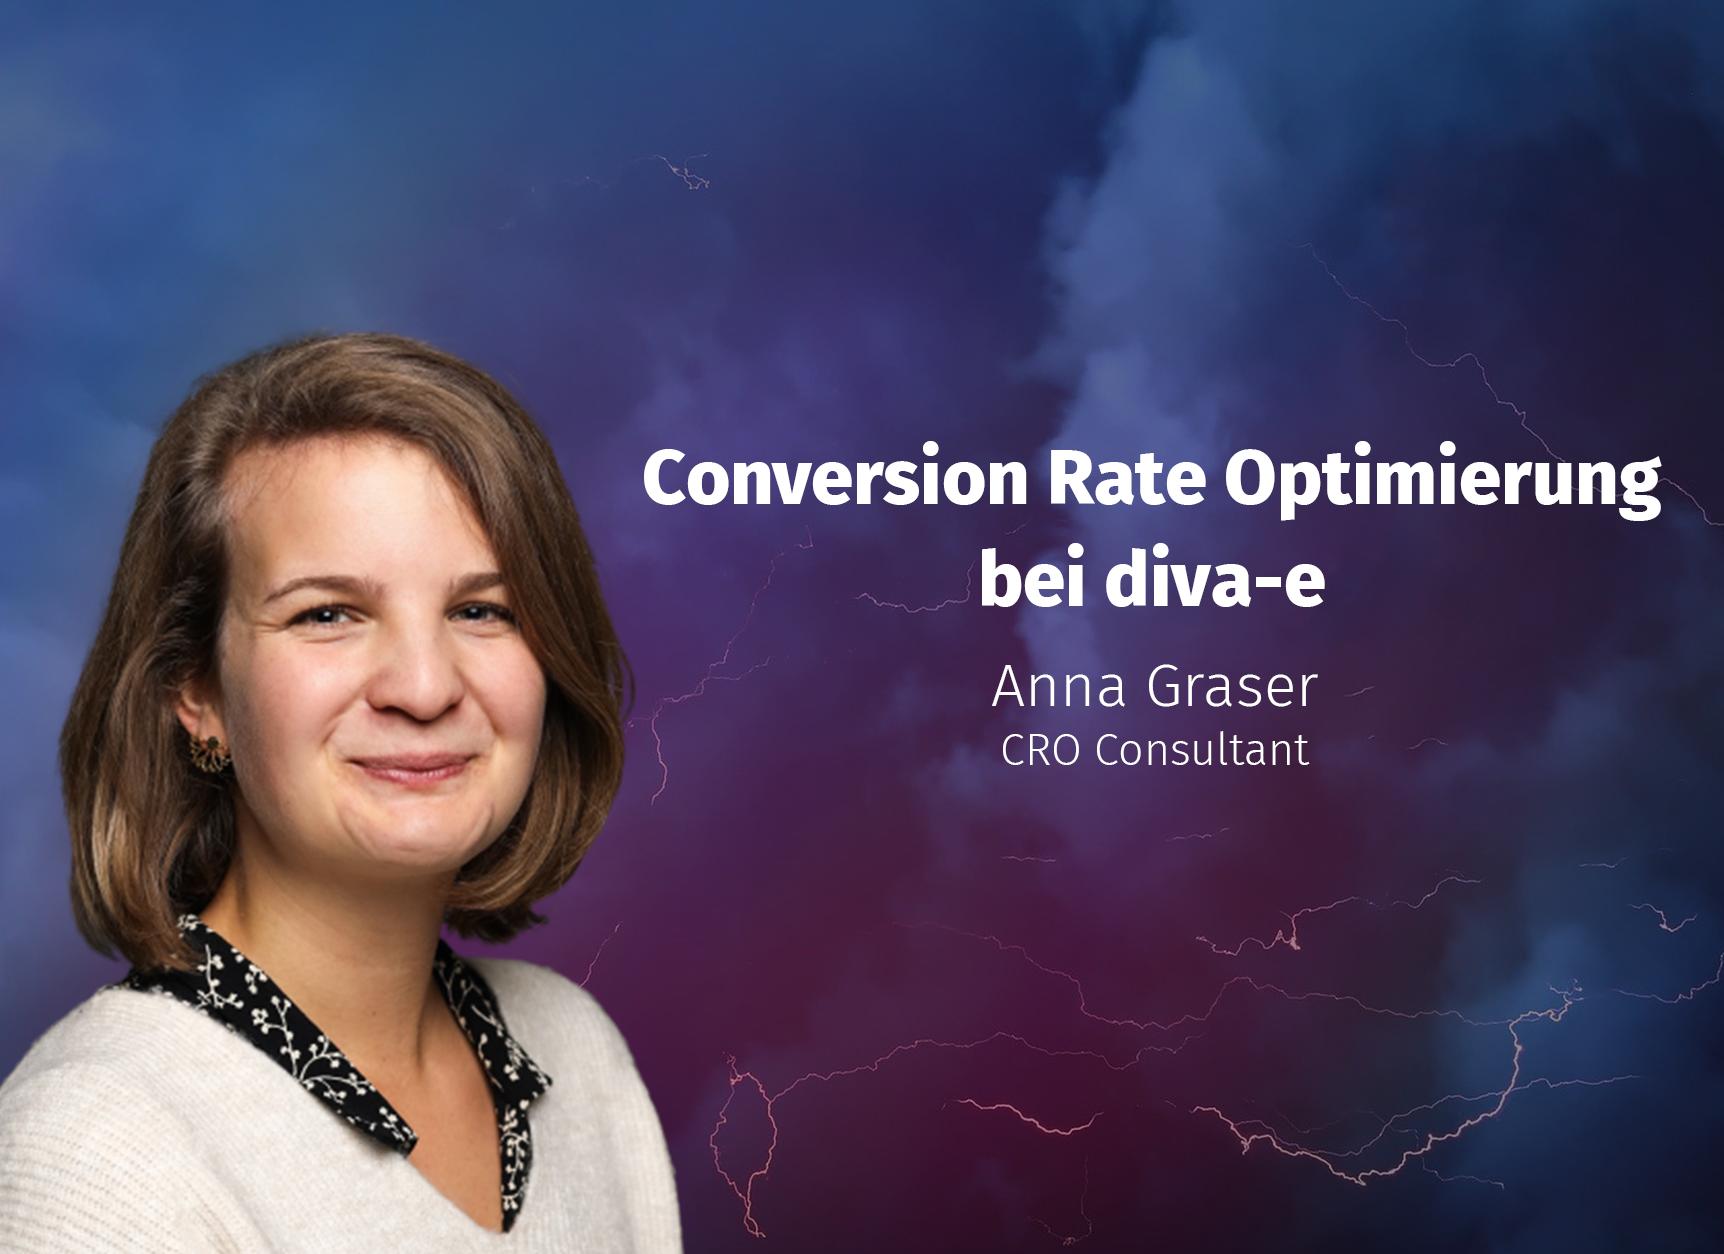 Conversion Rate Optimierung bei diva-e